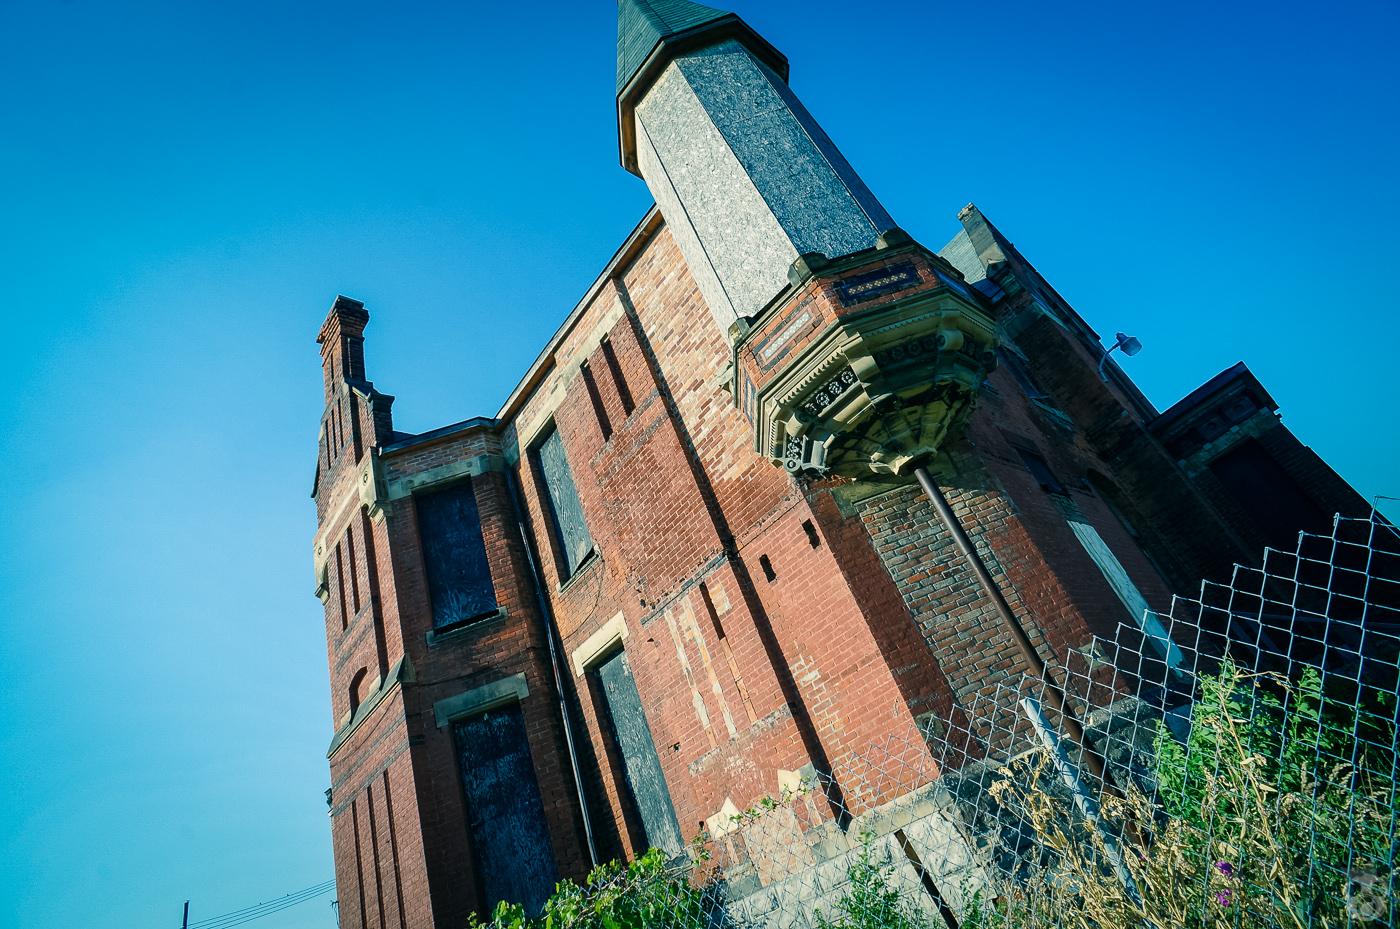 Brush Park Historic District  ブラシパーク歴史地区の廃墟郡